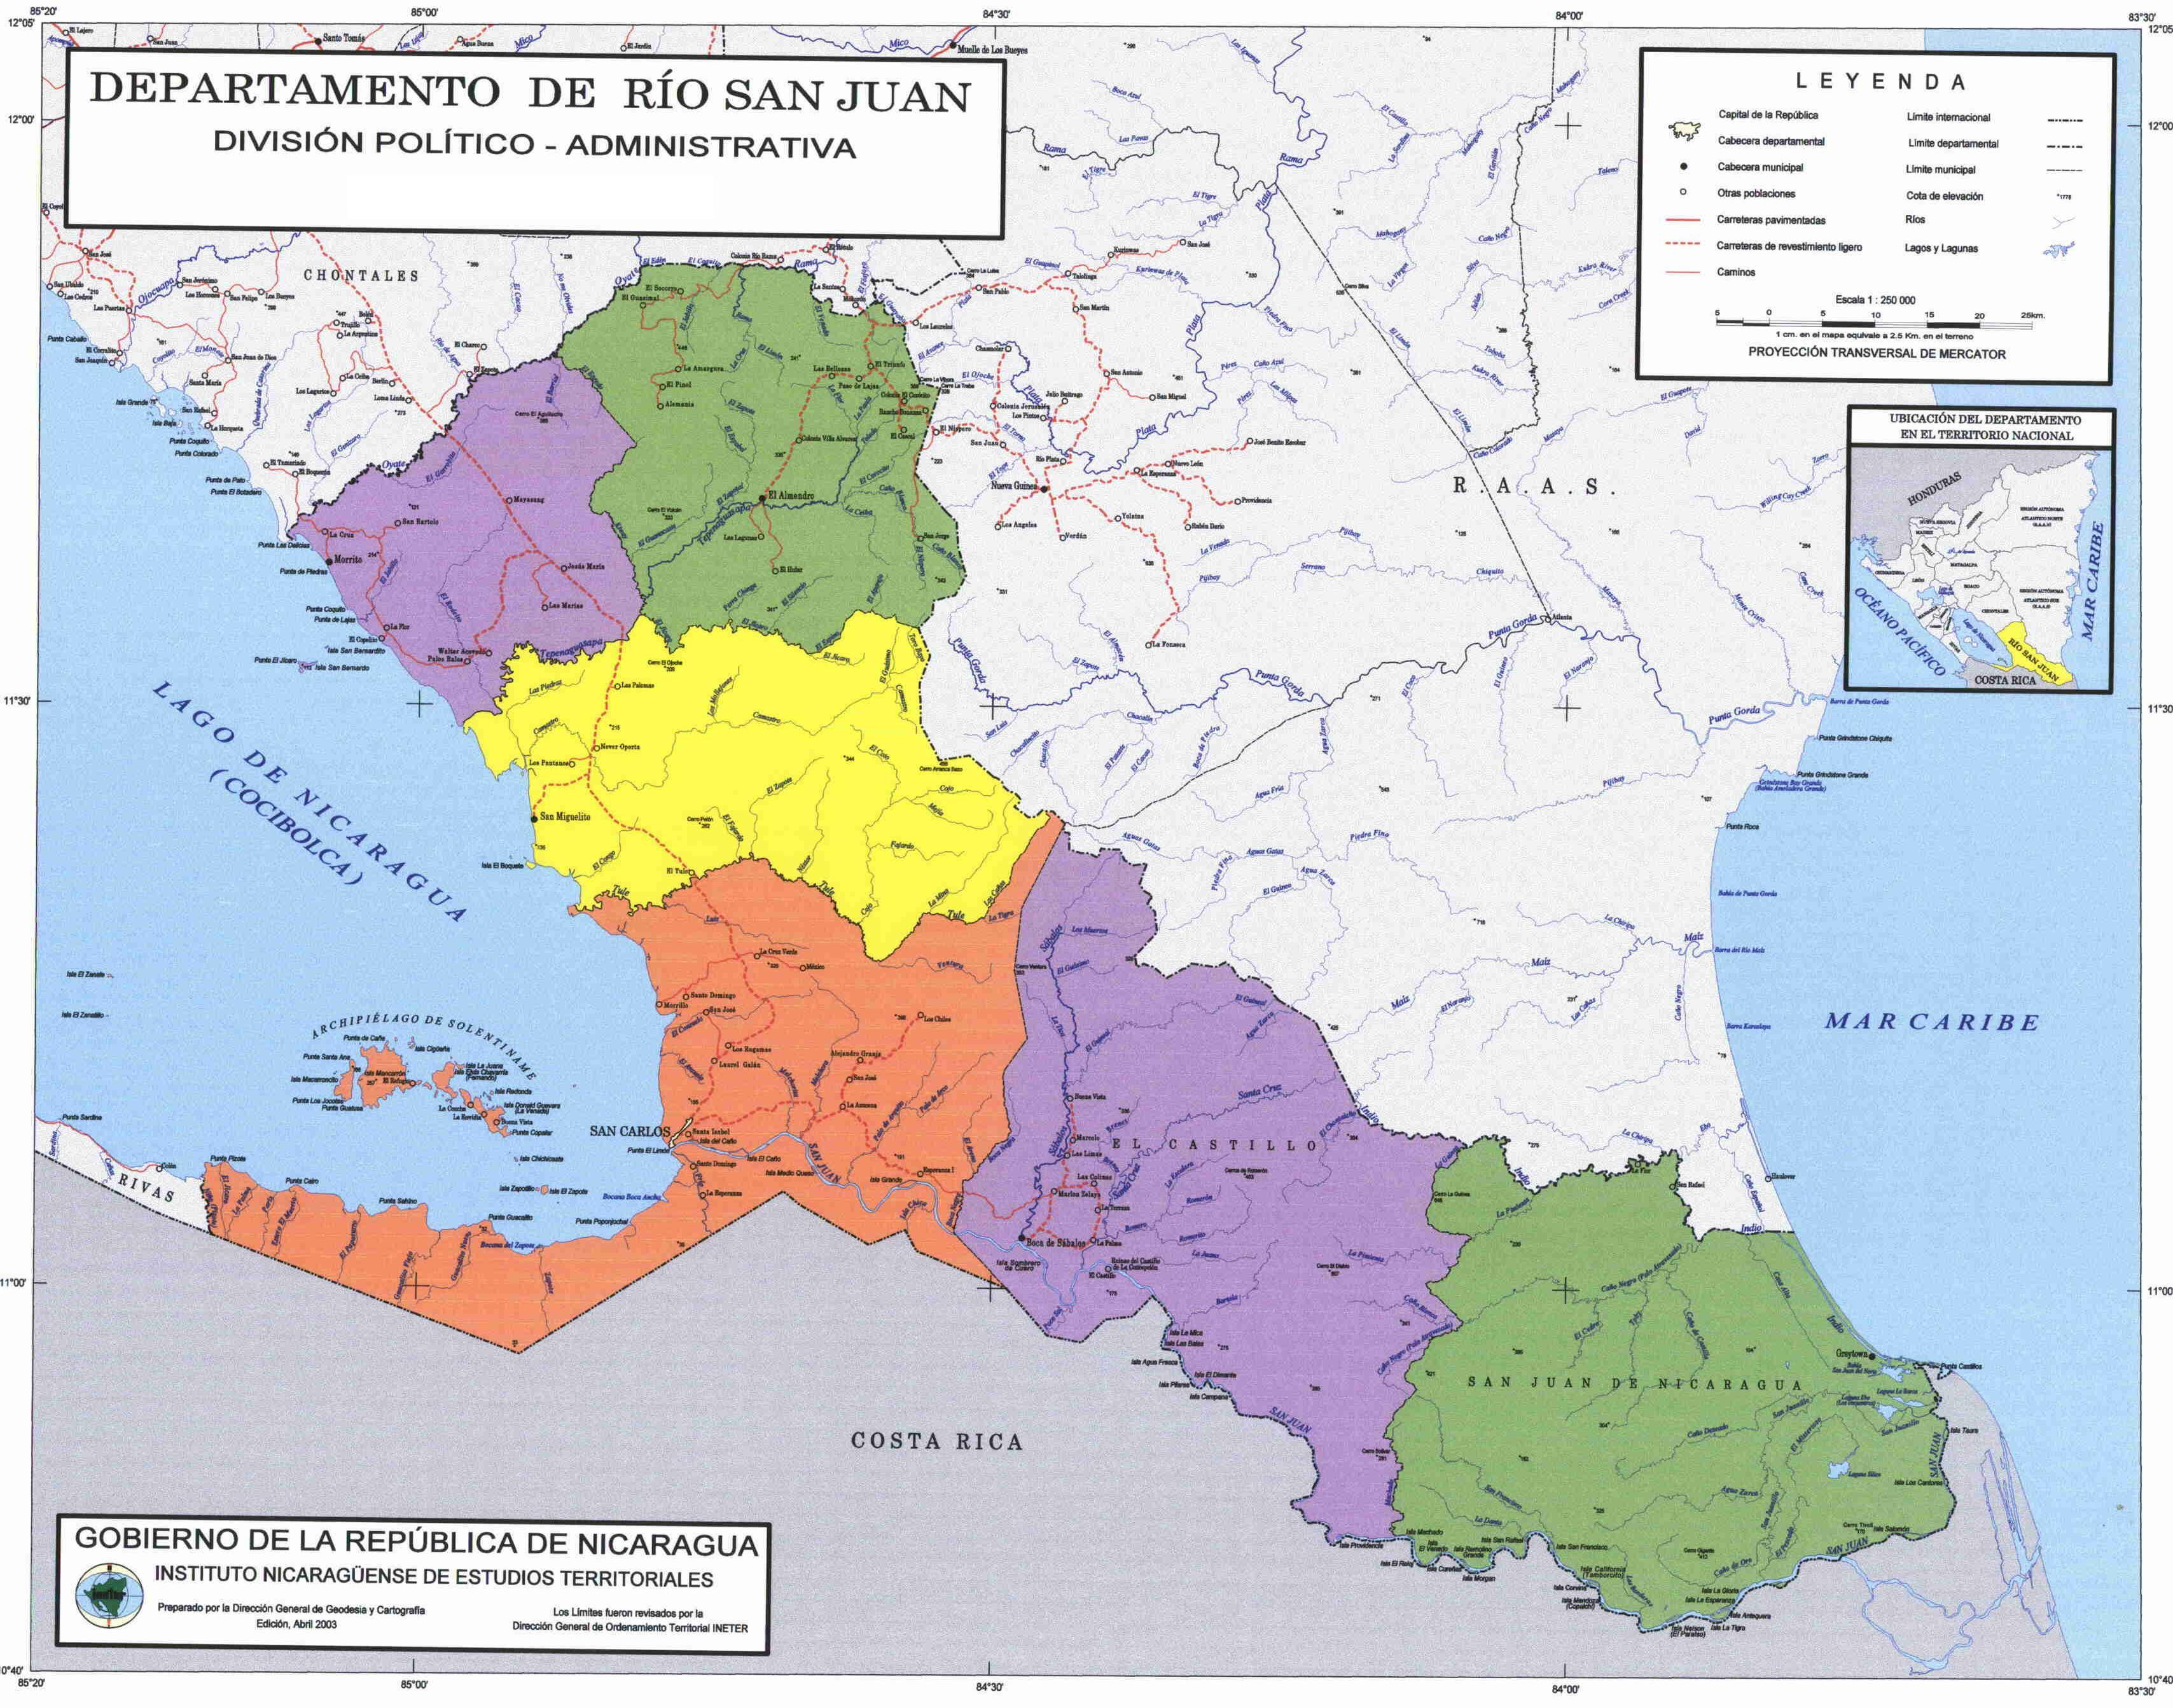 Rio San Juan Administrative Political Map, Nicaragua